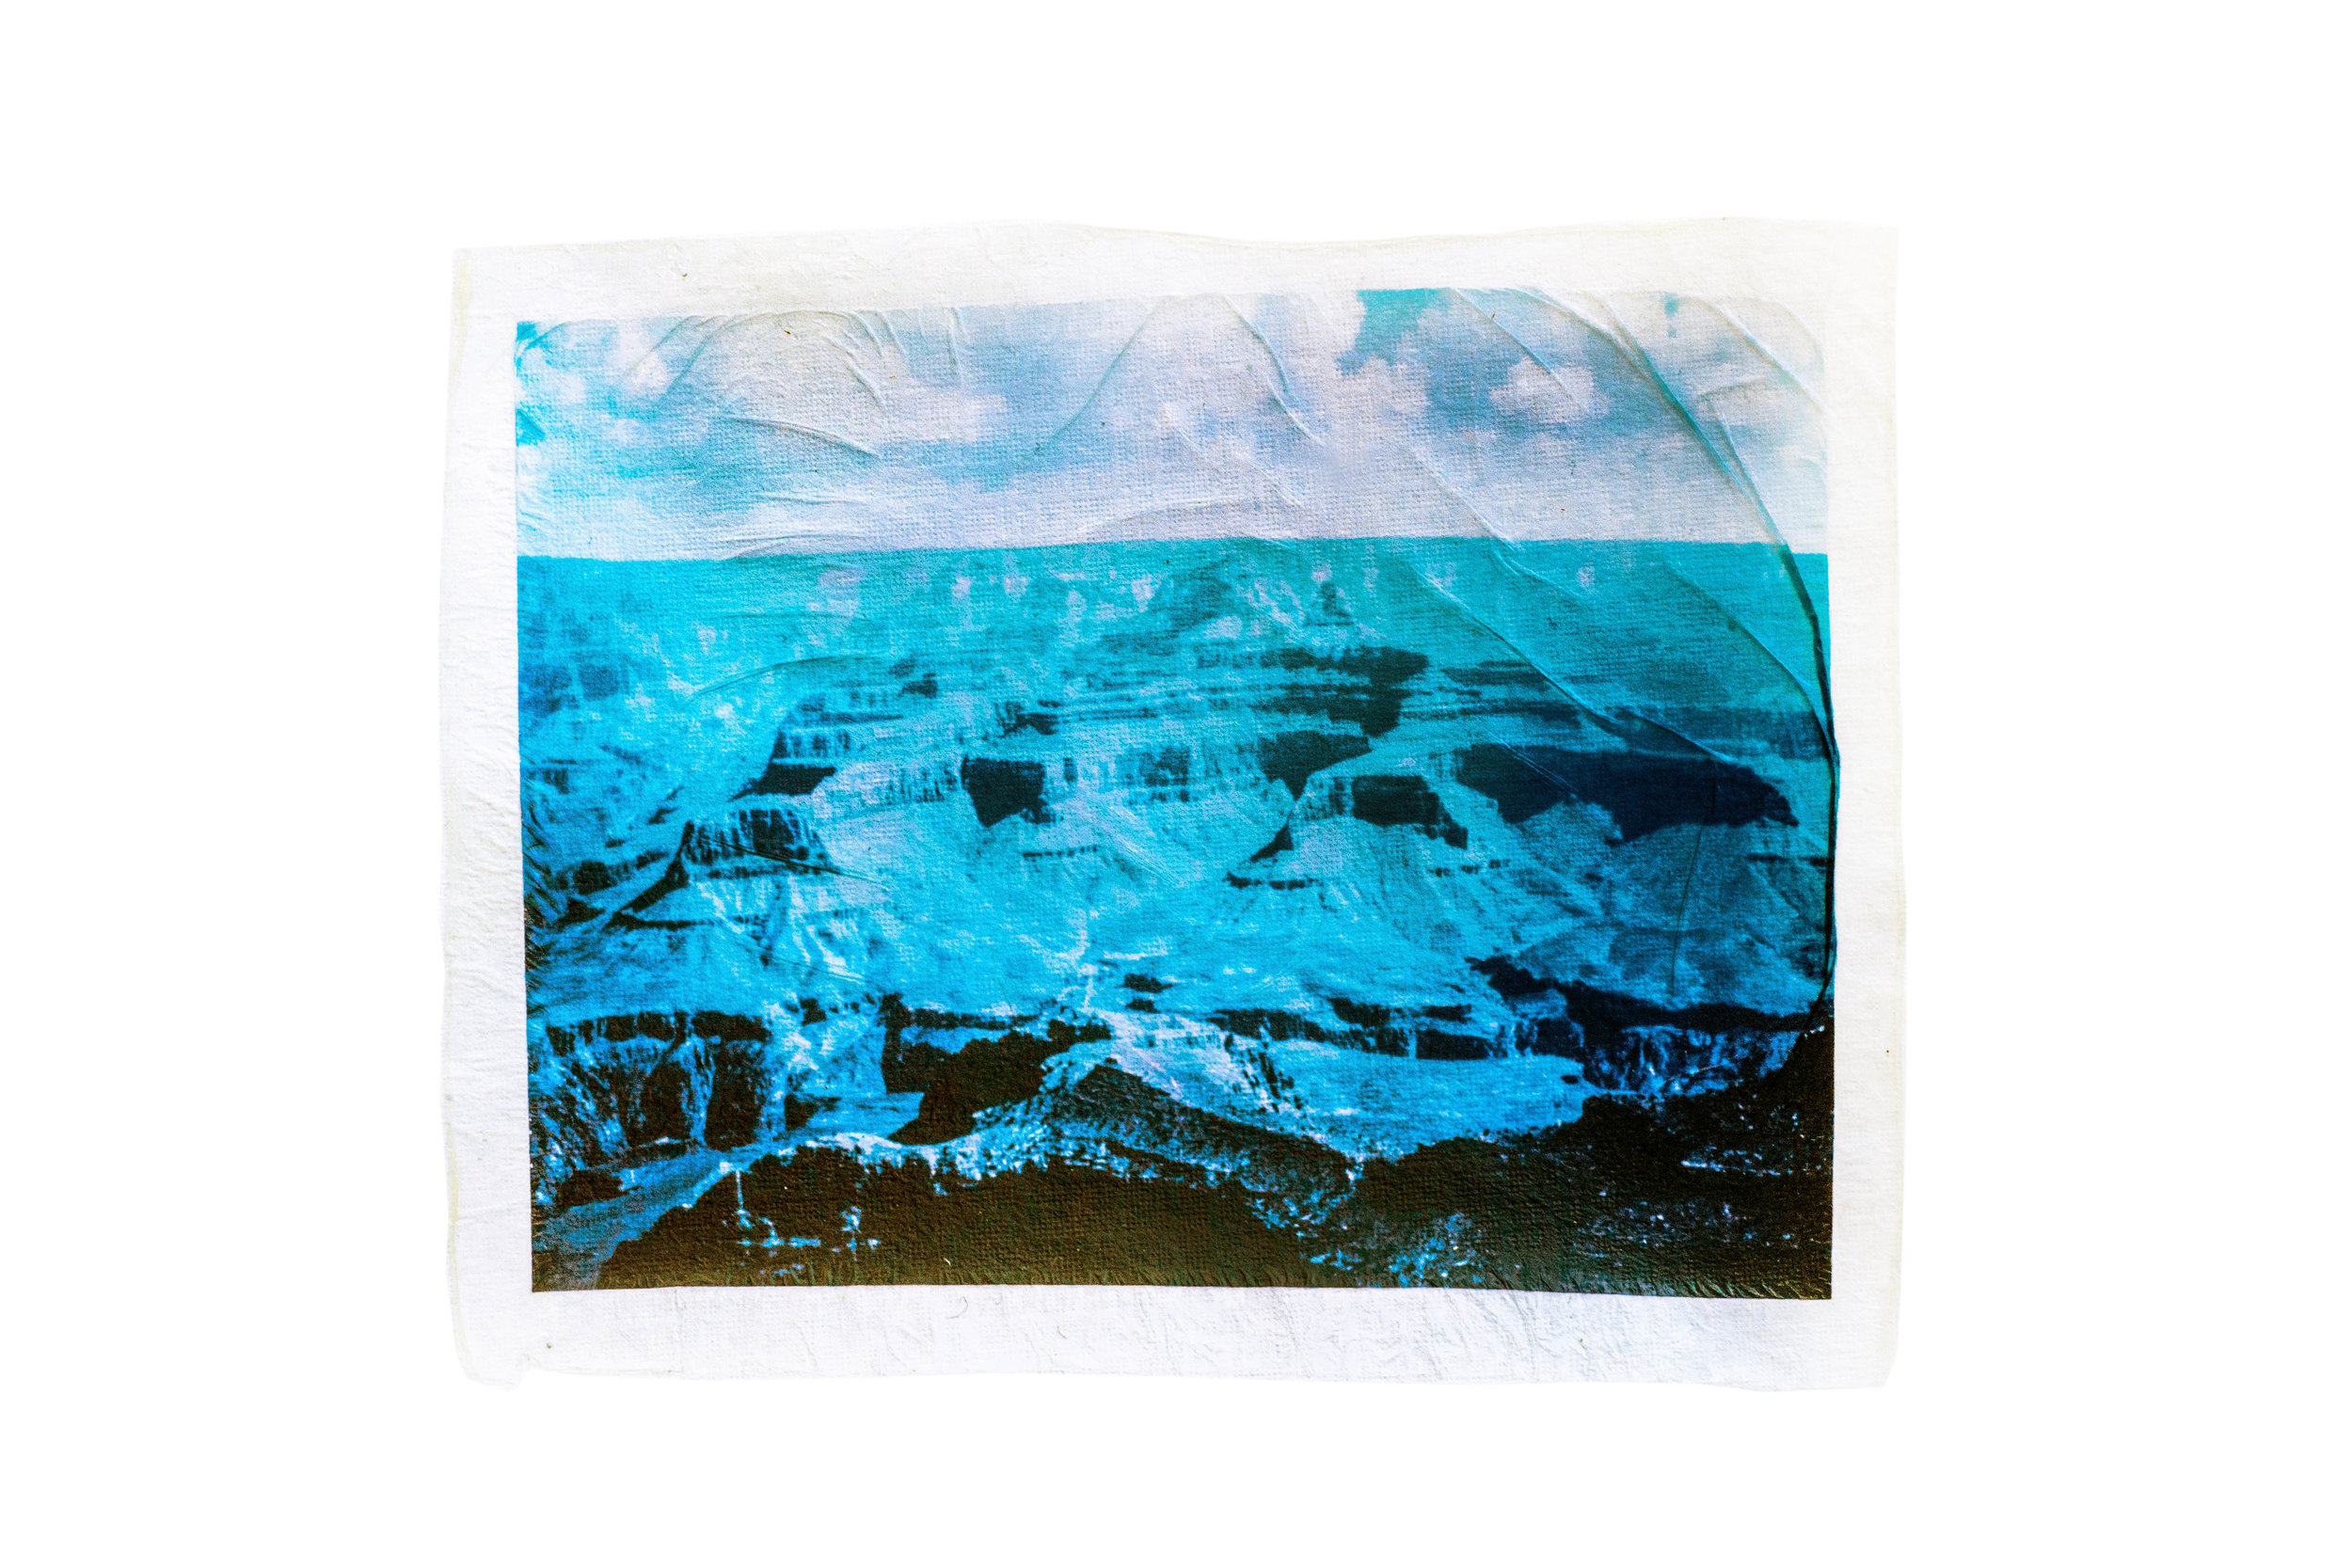 GRAND  remainder / reminder  Jordan Hefler  Kodachrome Slide 1972 / Fujifilm Emulsion Lift 2014